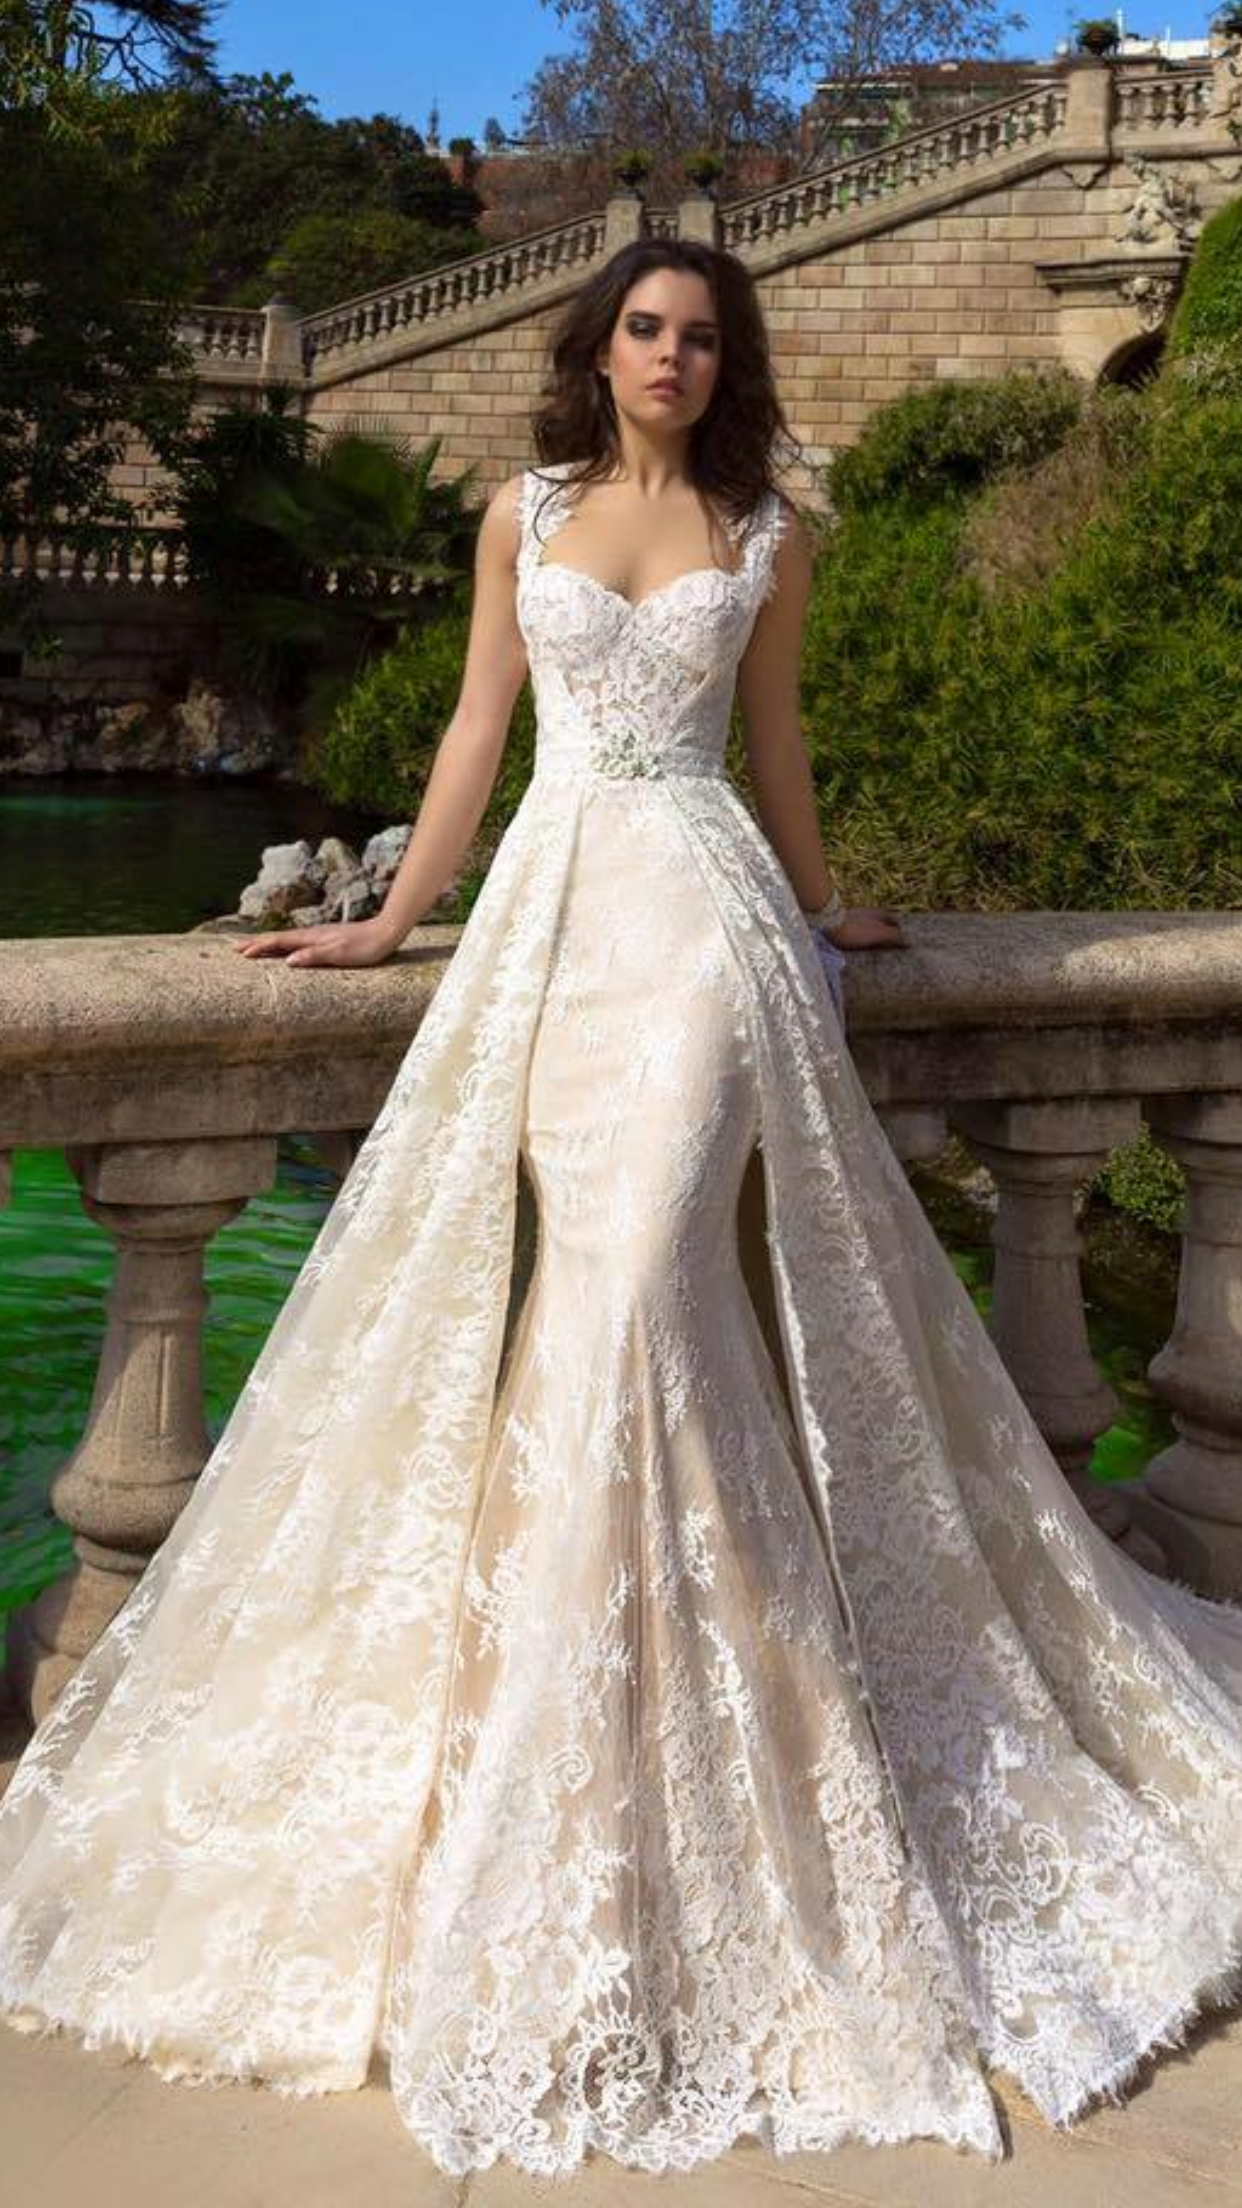 Nice wedding dresses  Nice  Wedding bullshit  Pinterest  Nice Wedding dress and Wedding